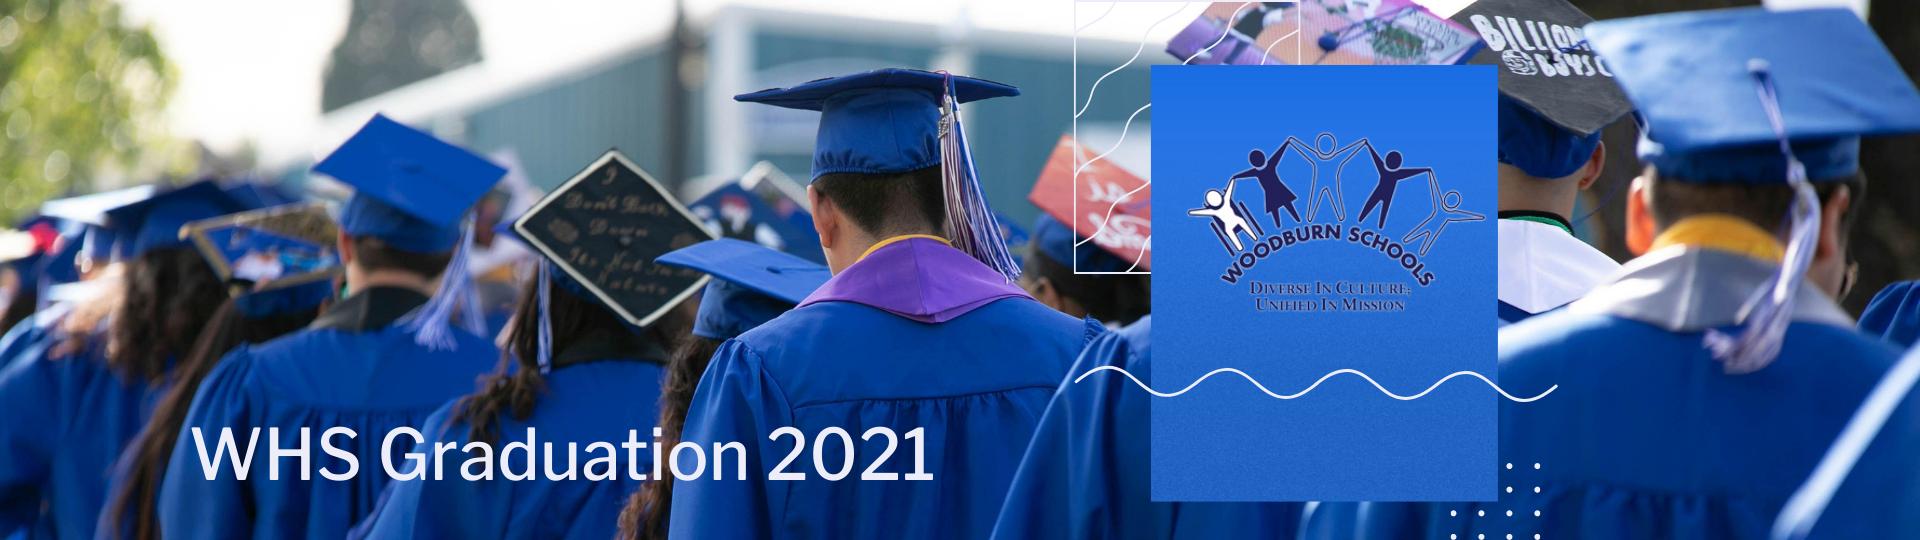 WHS Graduation Day 2021